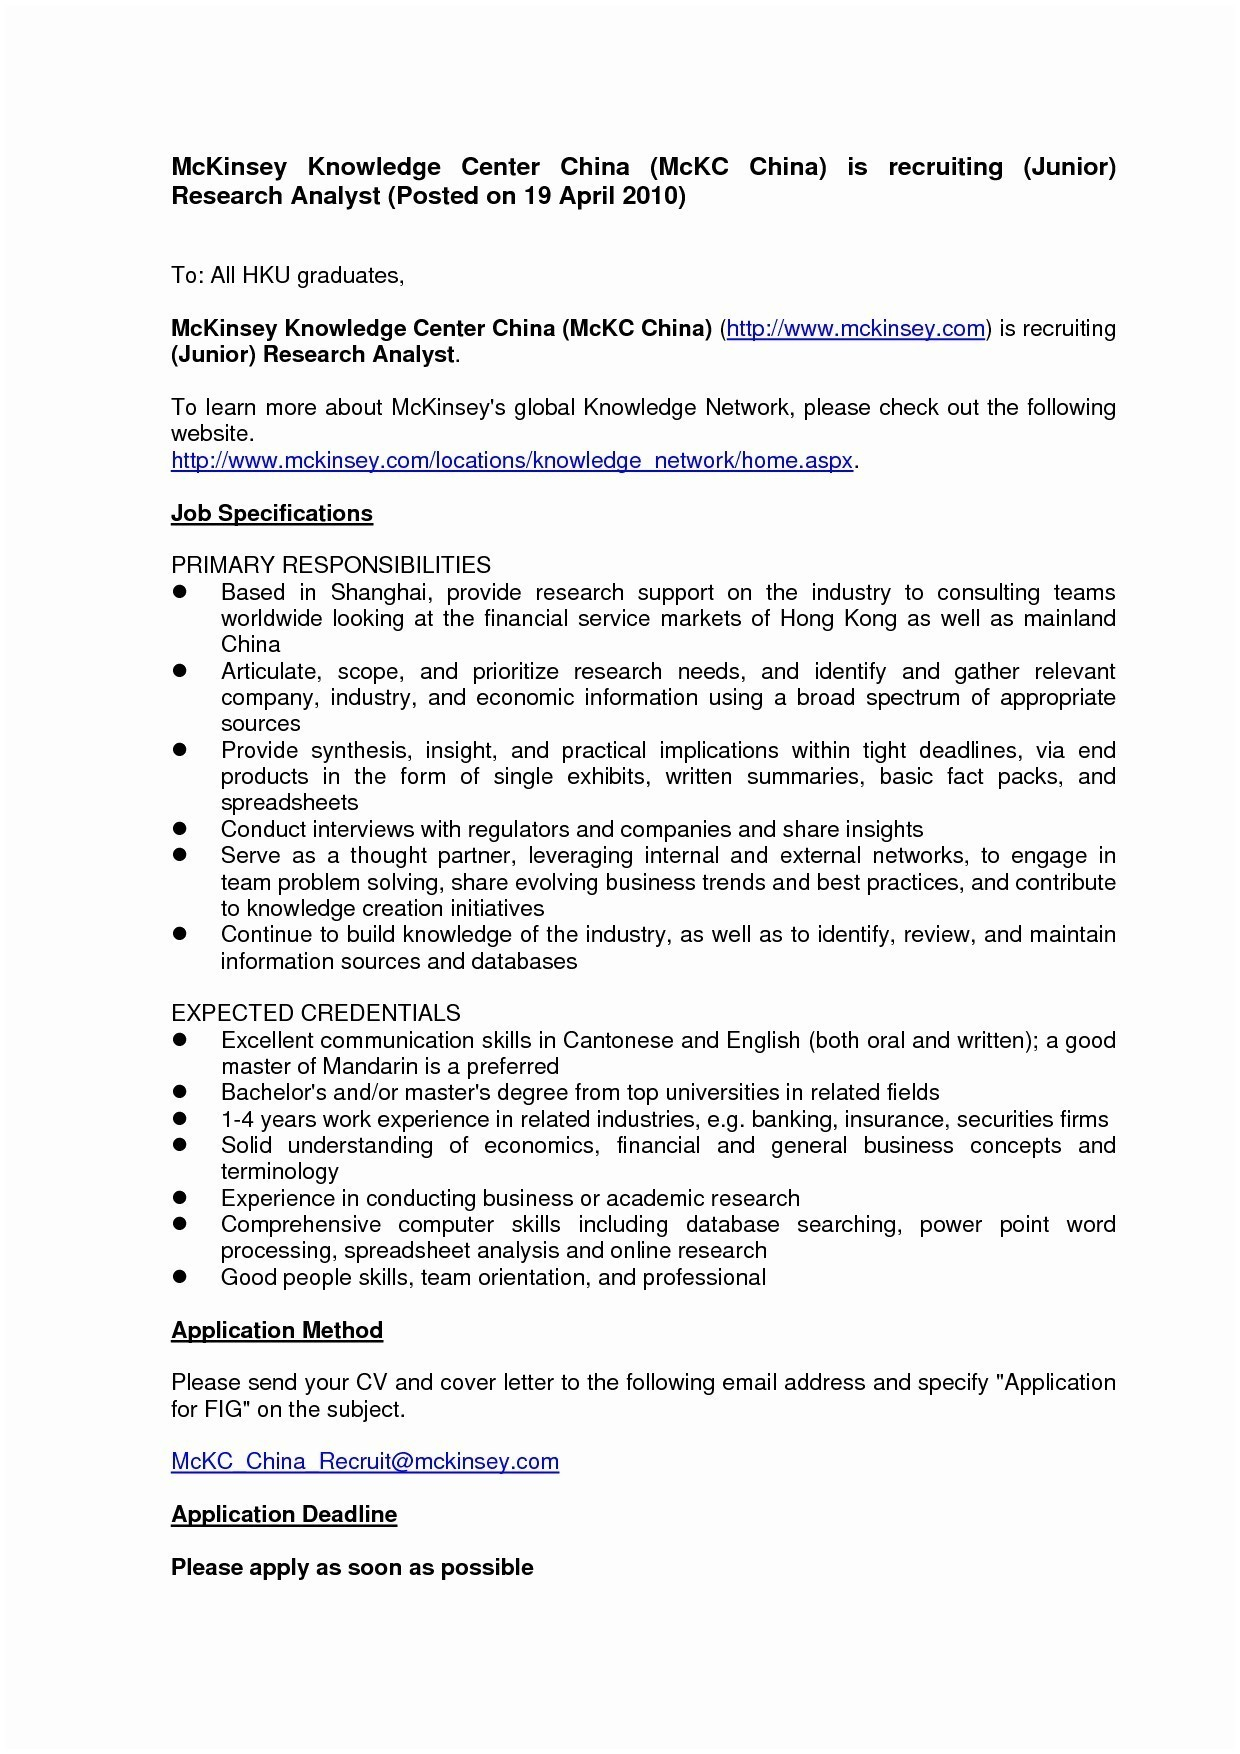 Sample Job Offer Letter Template - formal Job Fer Letter Inspirationa Sample for Job Fer Letter Fresh